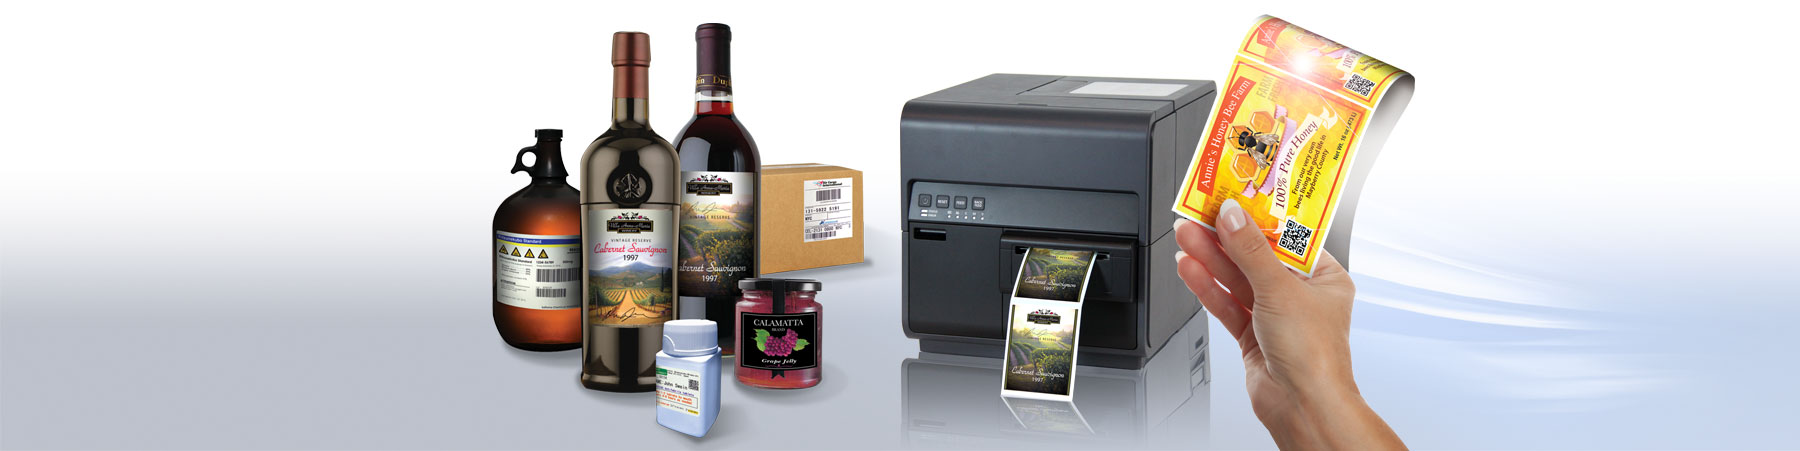 Swiftcolor Digital Inkjet On Demand Short Run Label Printing